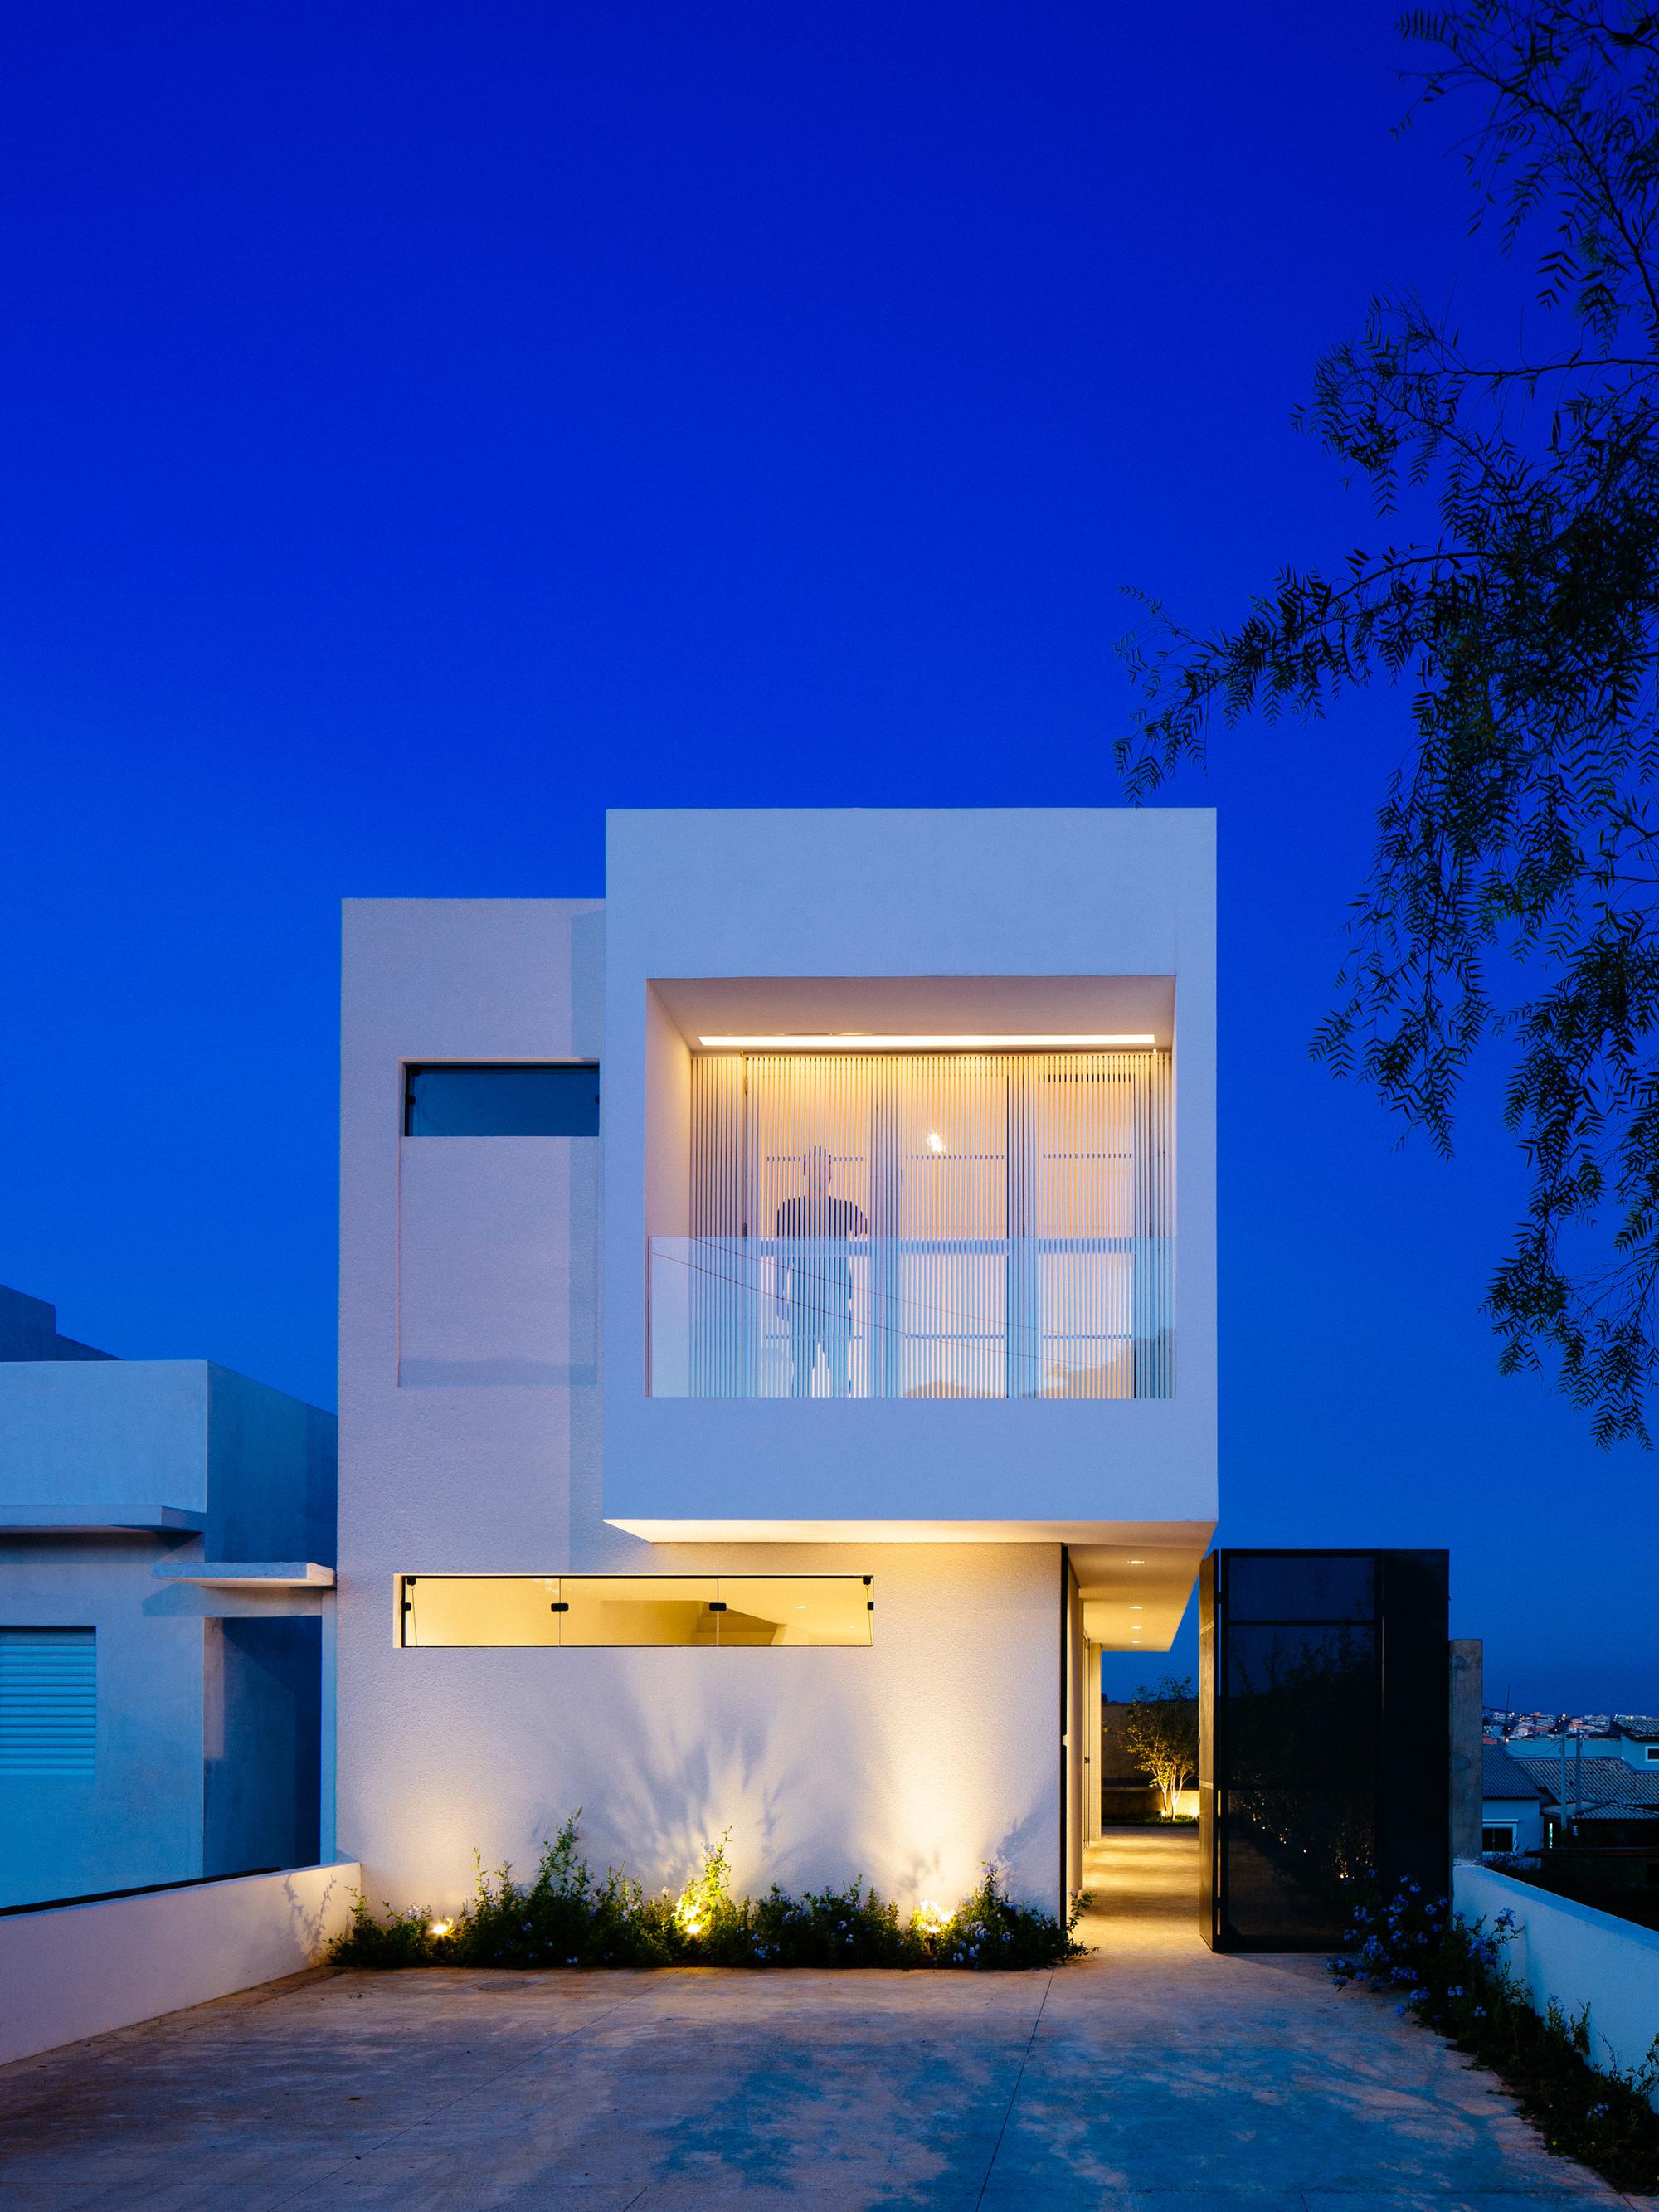 Gallery of sorocaba house estudio bra arquitetura 3 for Casa minimalistas